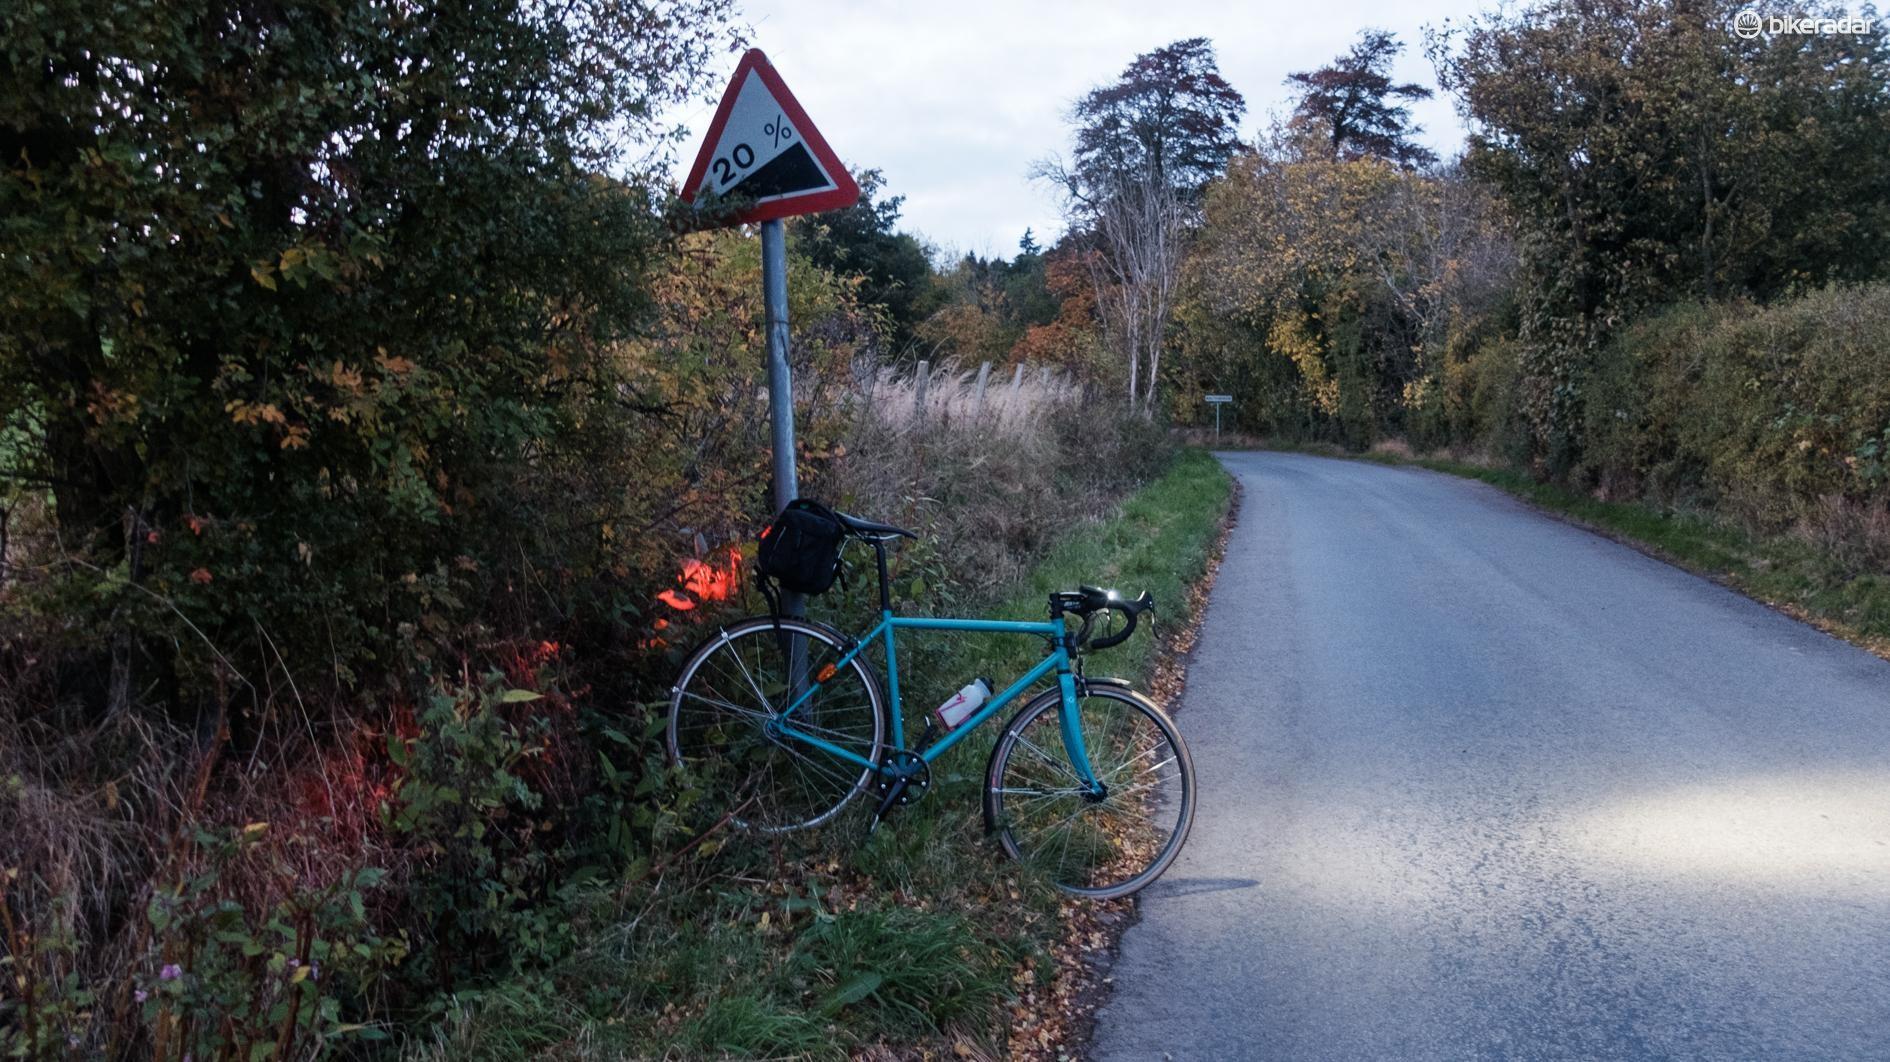 Remind me why I chose to test a fixed gear bike?